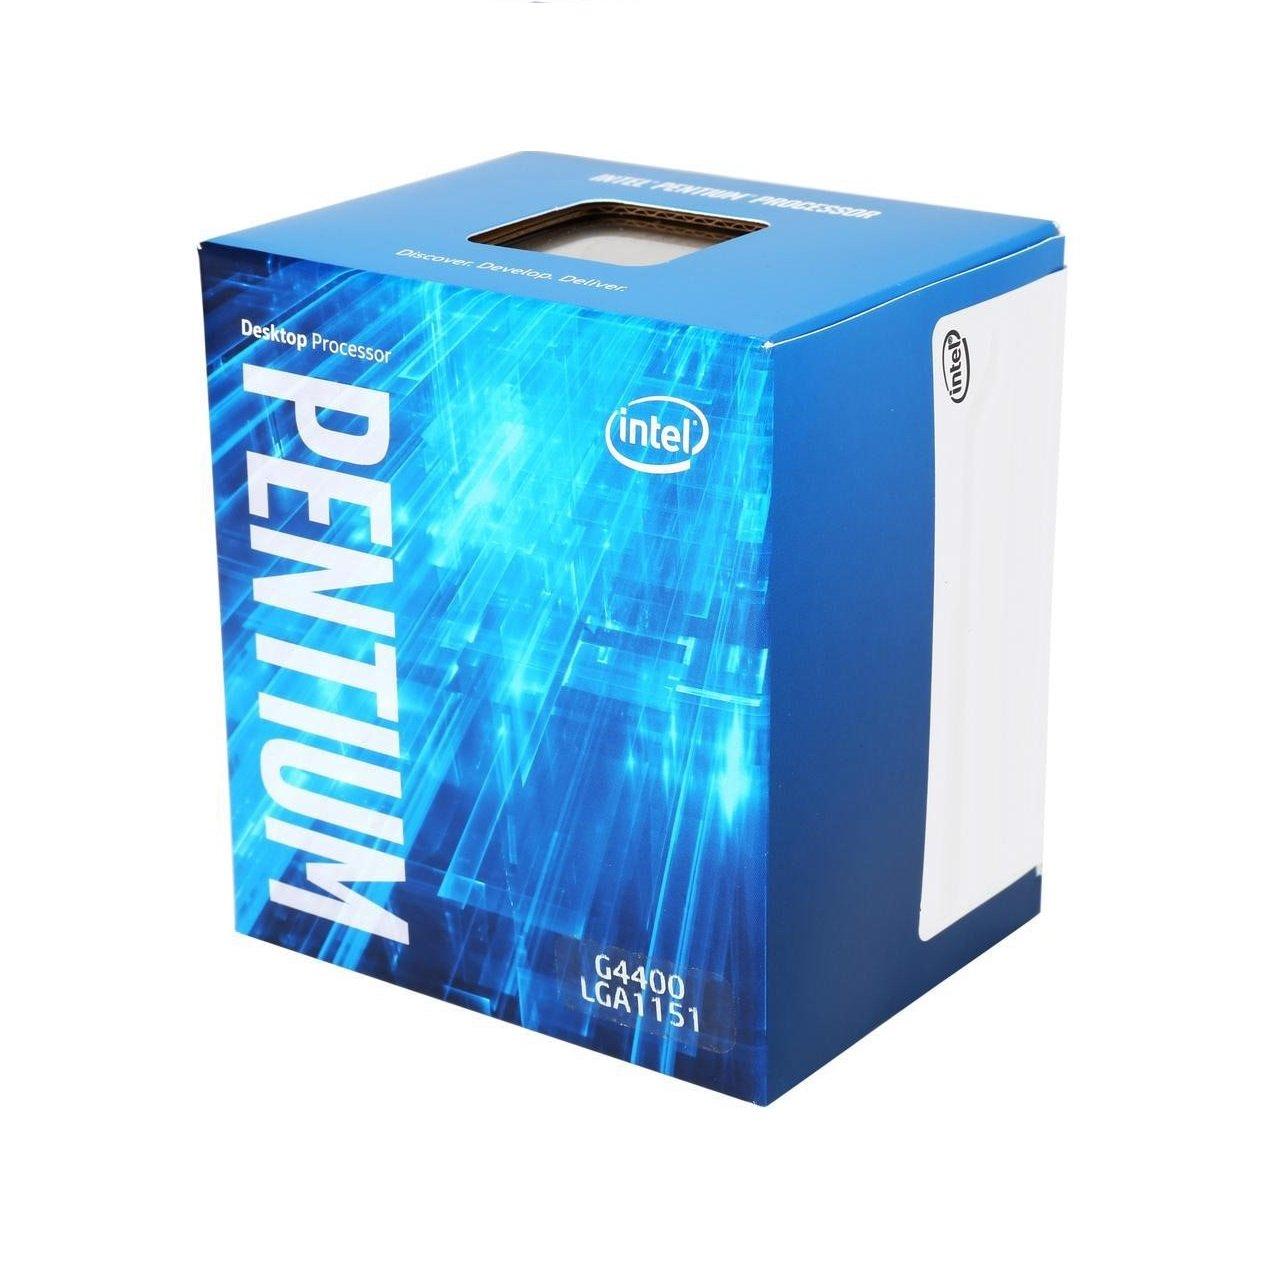 Intel Pentium Processor G4400 (3M Cache, 3.30 GHz)